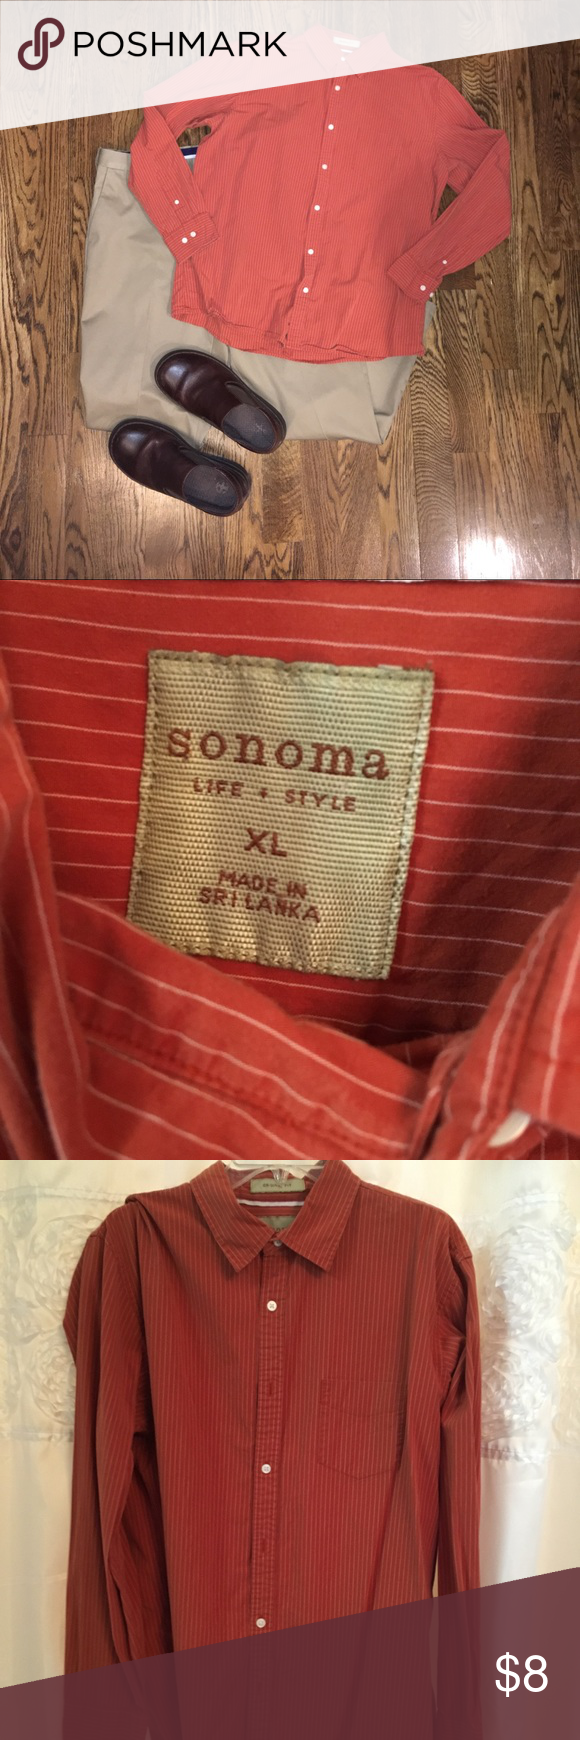 Mens Xl Orange Stripe Sonoma Dress Shirt Mens Xl Long Sleeve Button Down Shirt Burnt Orange Color With Vertica Sonoma Shirts Mens Xl Casual Button Down Shirts [ 1740 x 580 Pixel ]